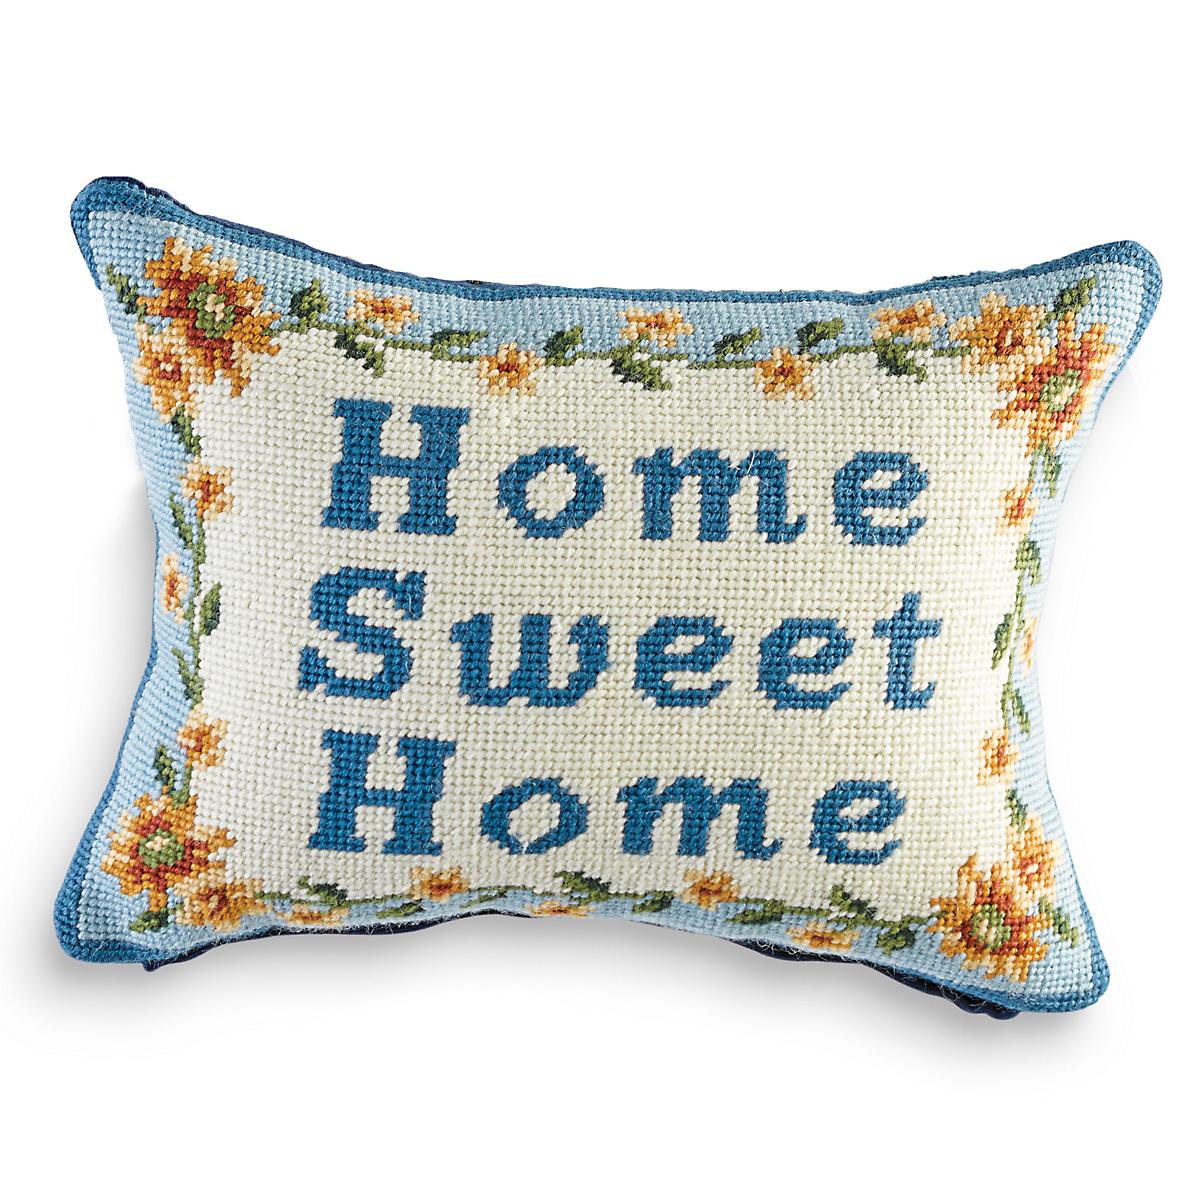 Home Sweet Home Needlepoint Pillow | Gump's